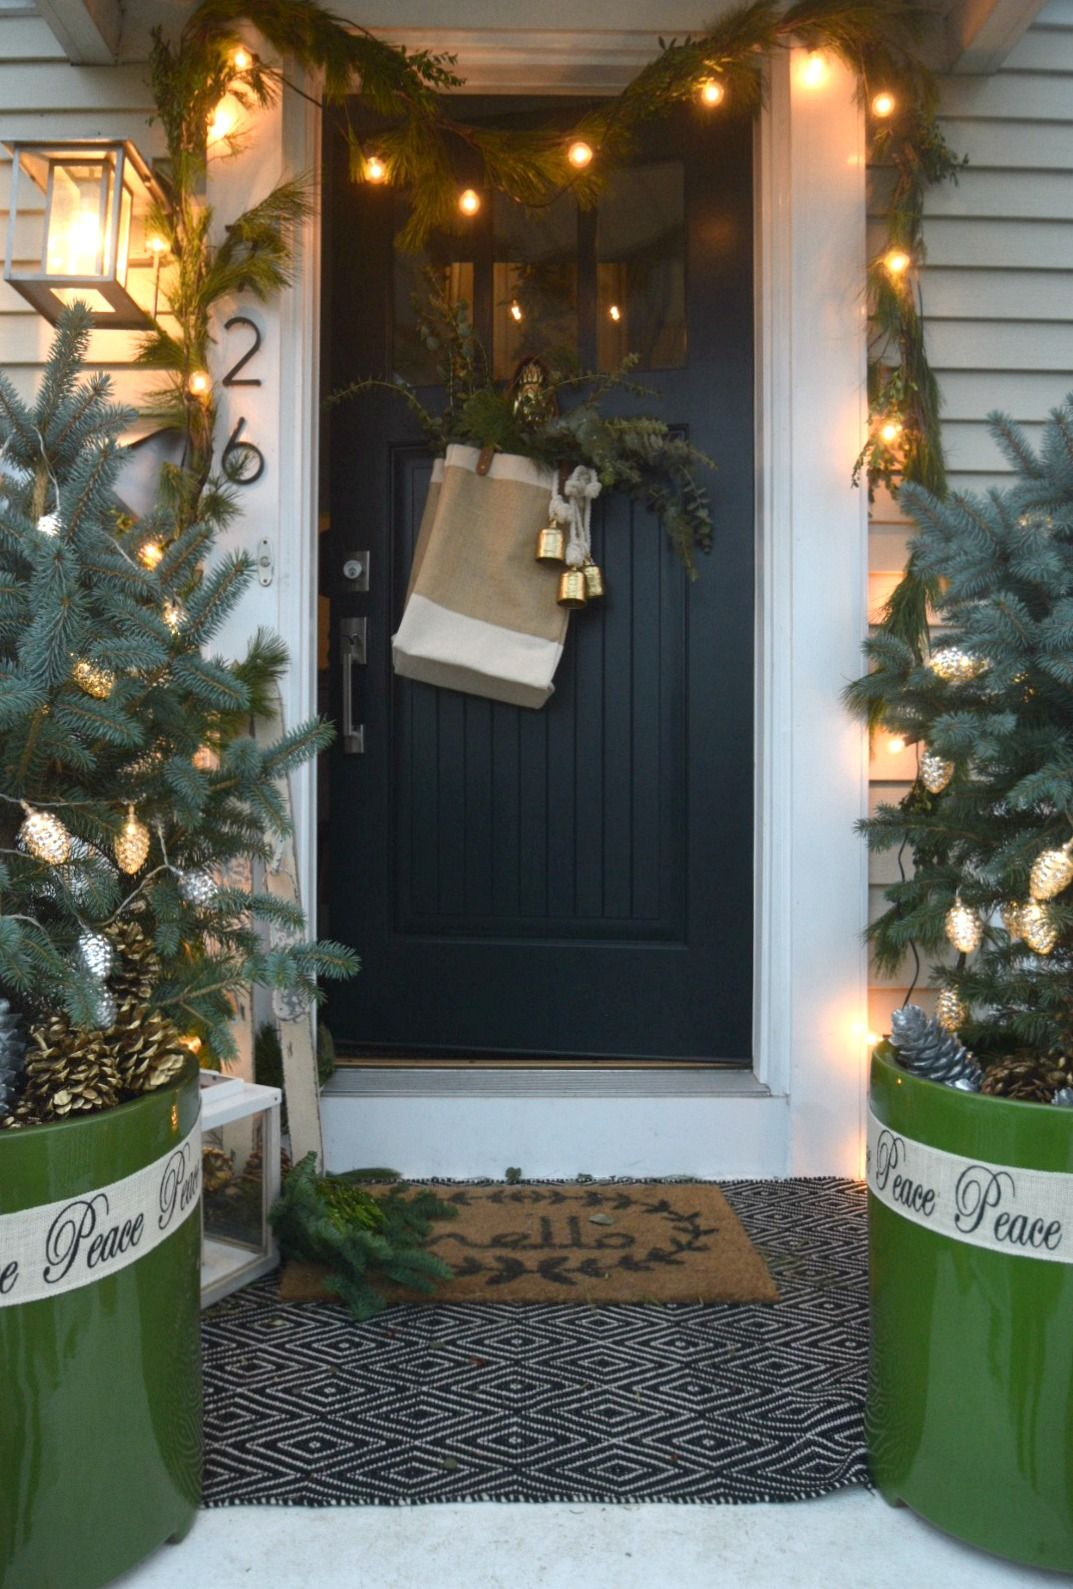 Christmas Ideas in a Small Space- Holiday Housewalk- Main Floor